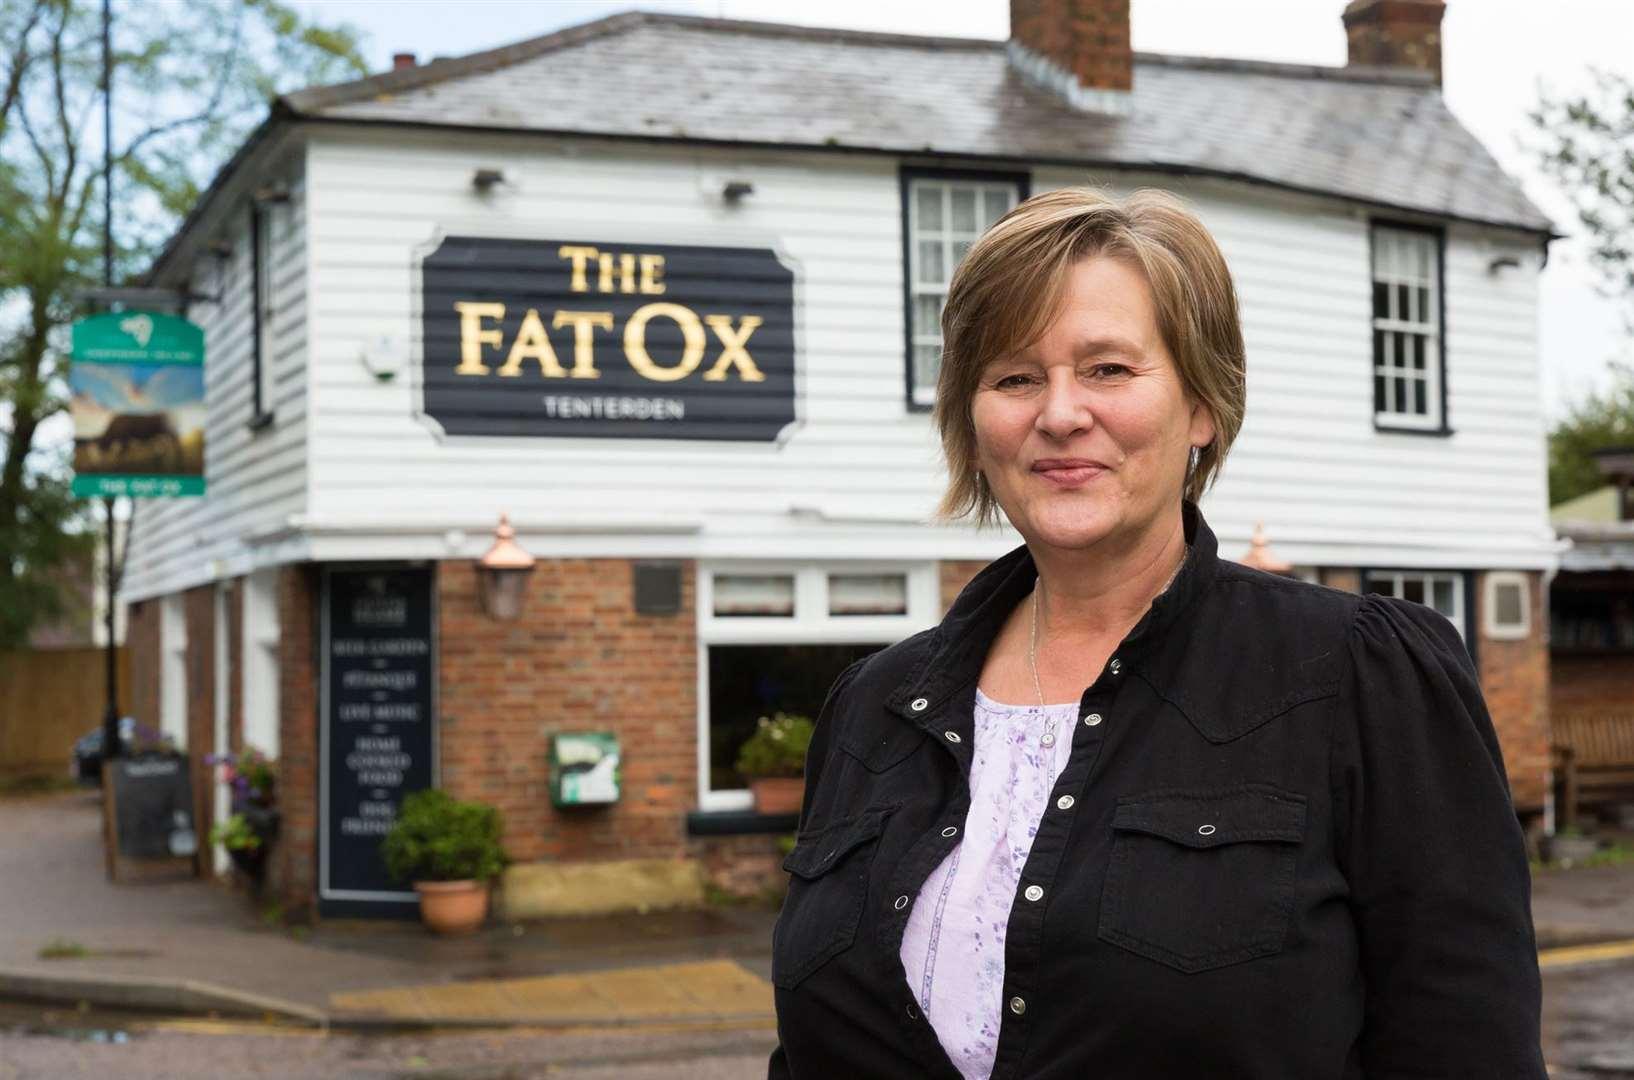 Carole Lofthouse is the owner of Fat Ox in St Michael's, Tenterden.  Photo: shepherd Neame